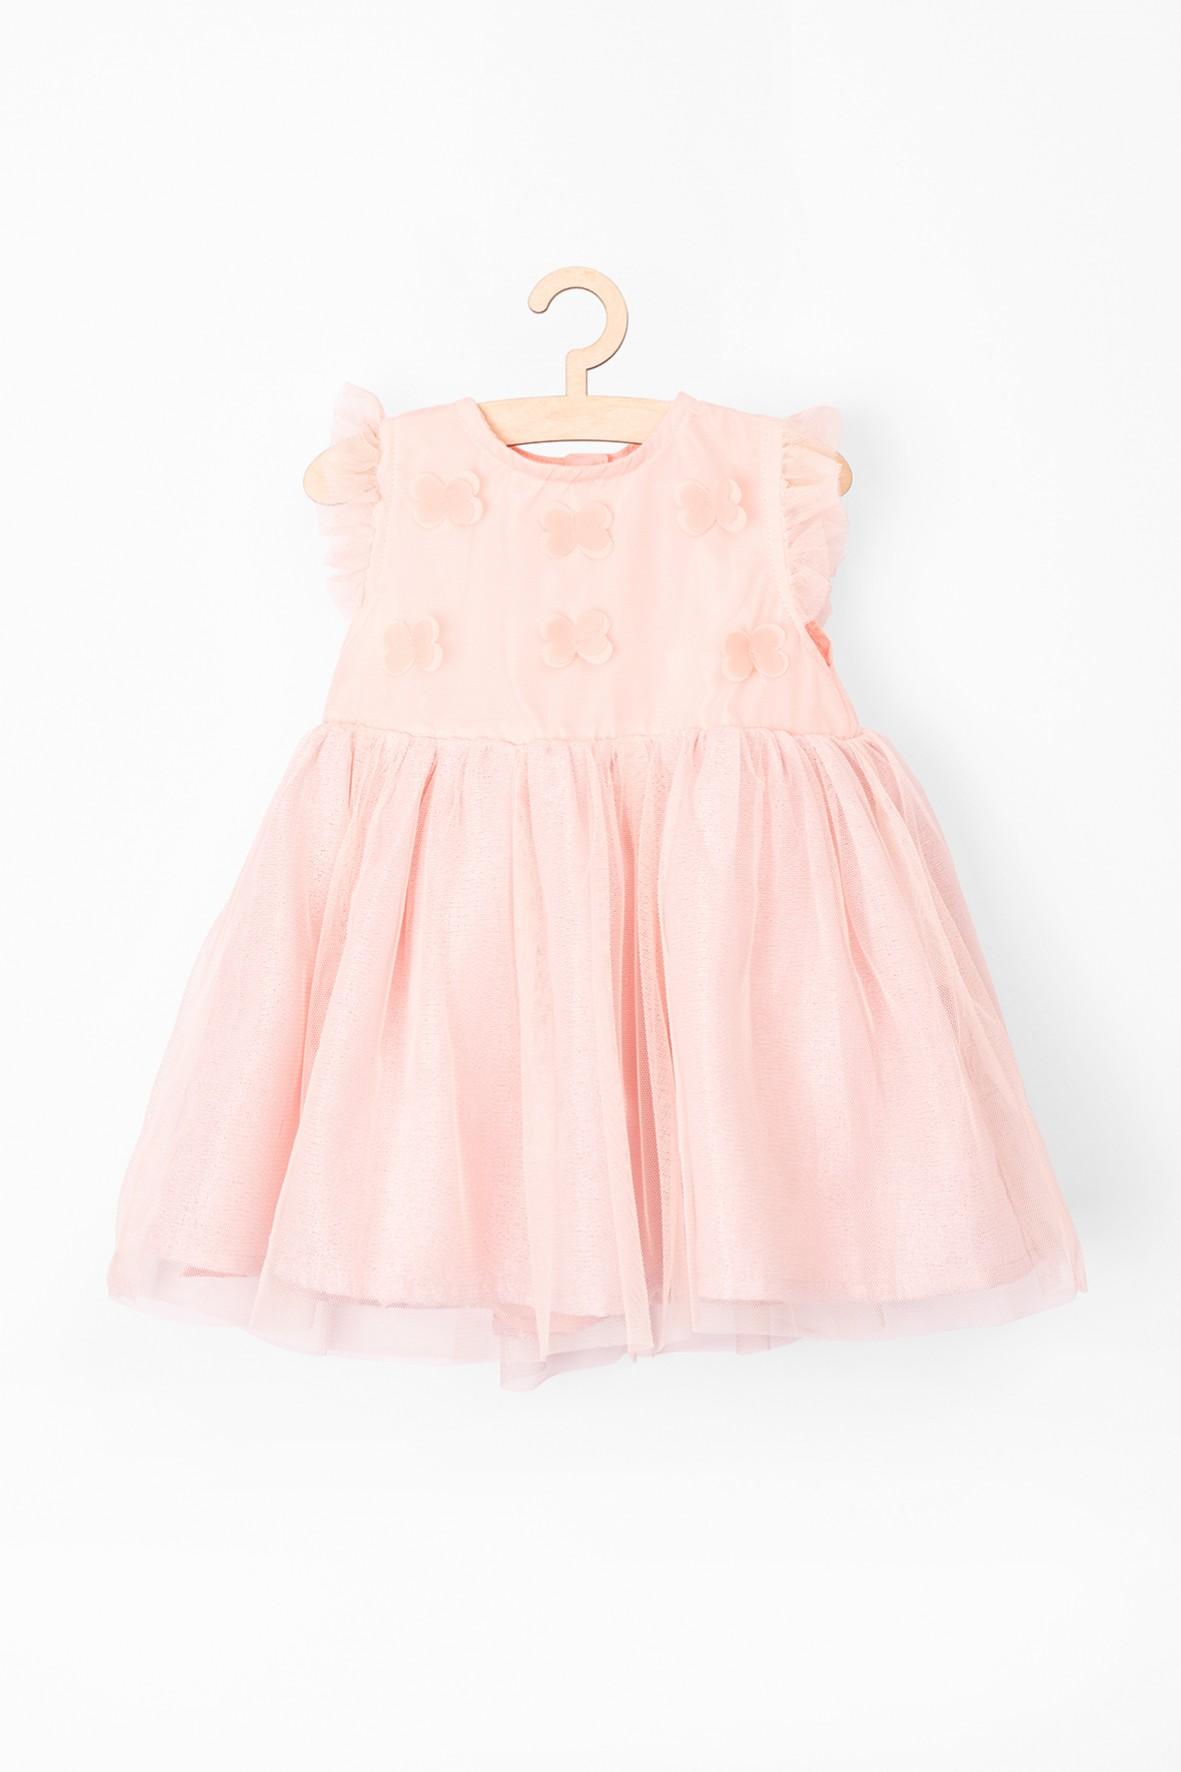 Tiulowa, elegancka sukienka dla niemowlaka